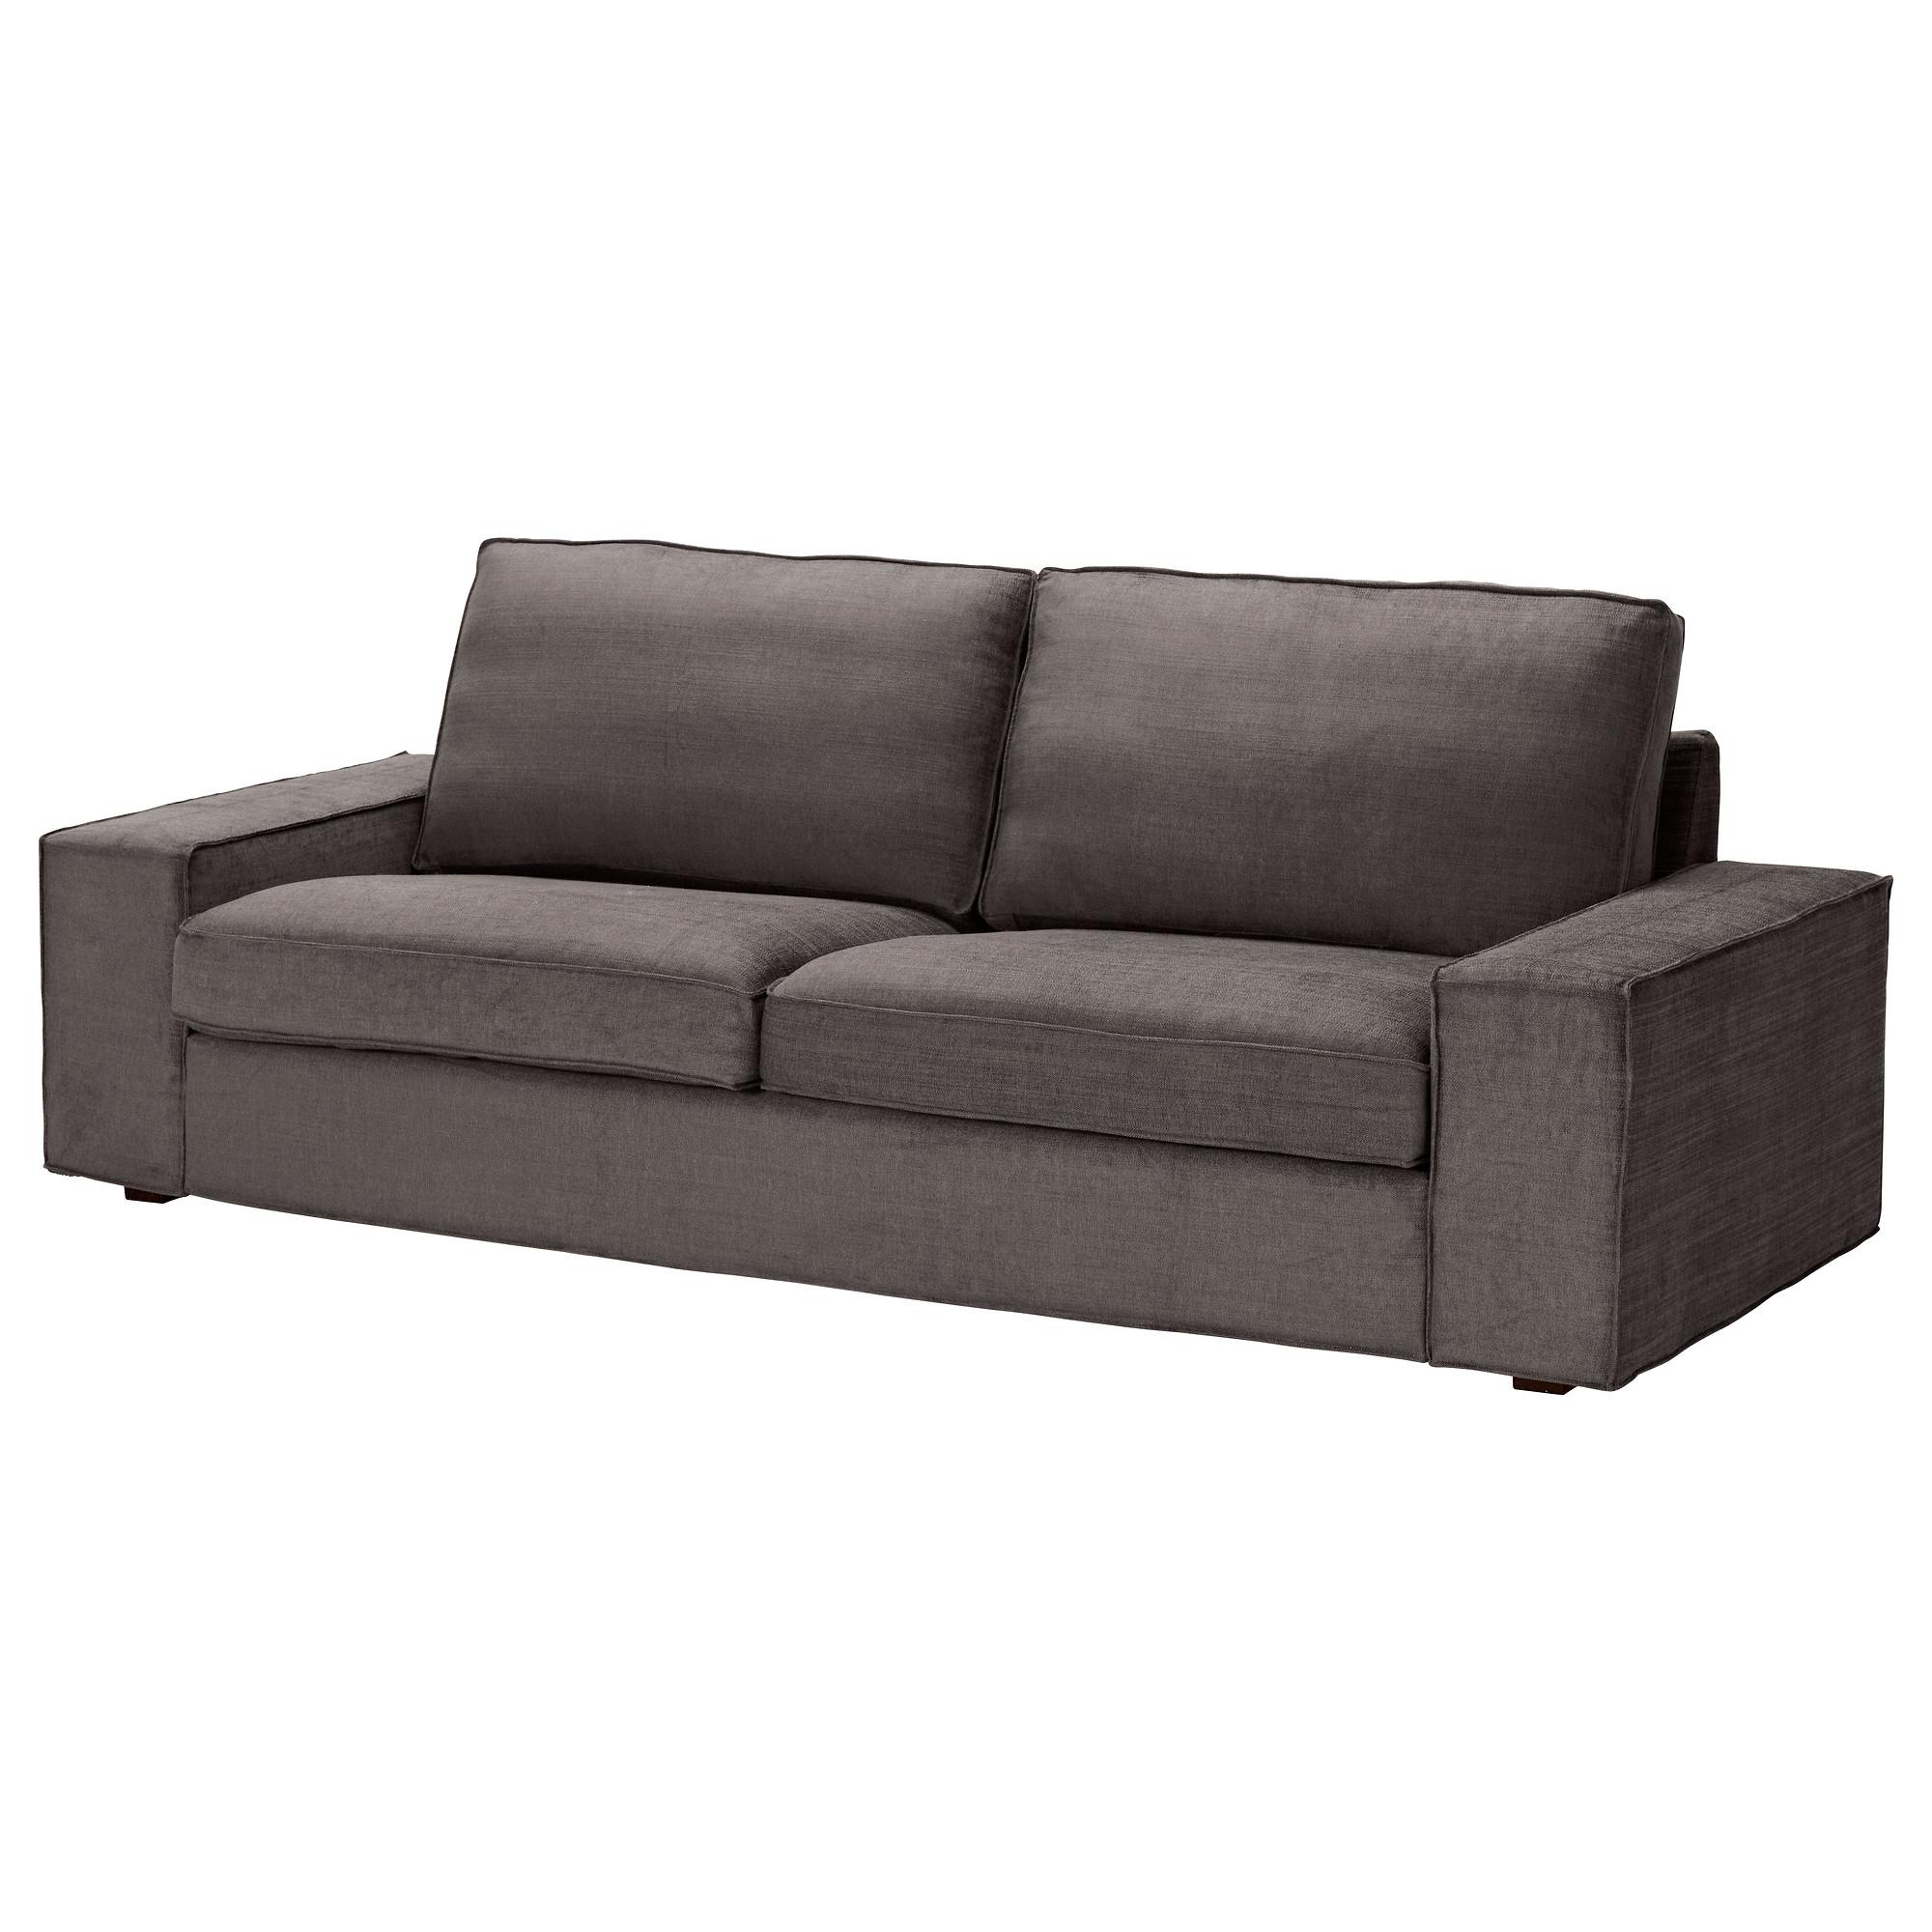 Kivik funda para sof de 3 plazas - Funda sofa 3 plazas ...